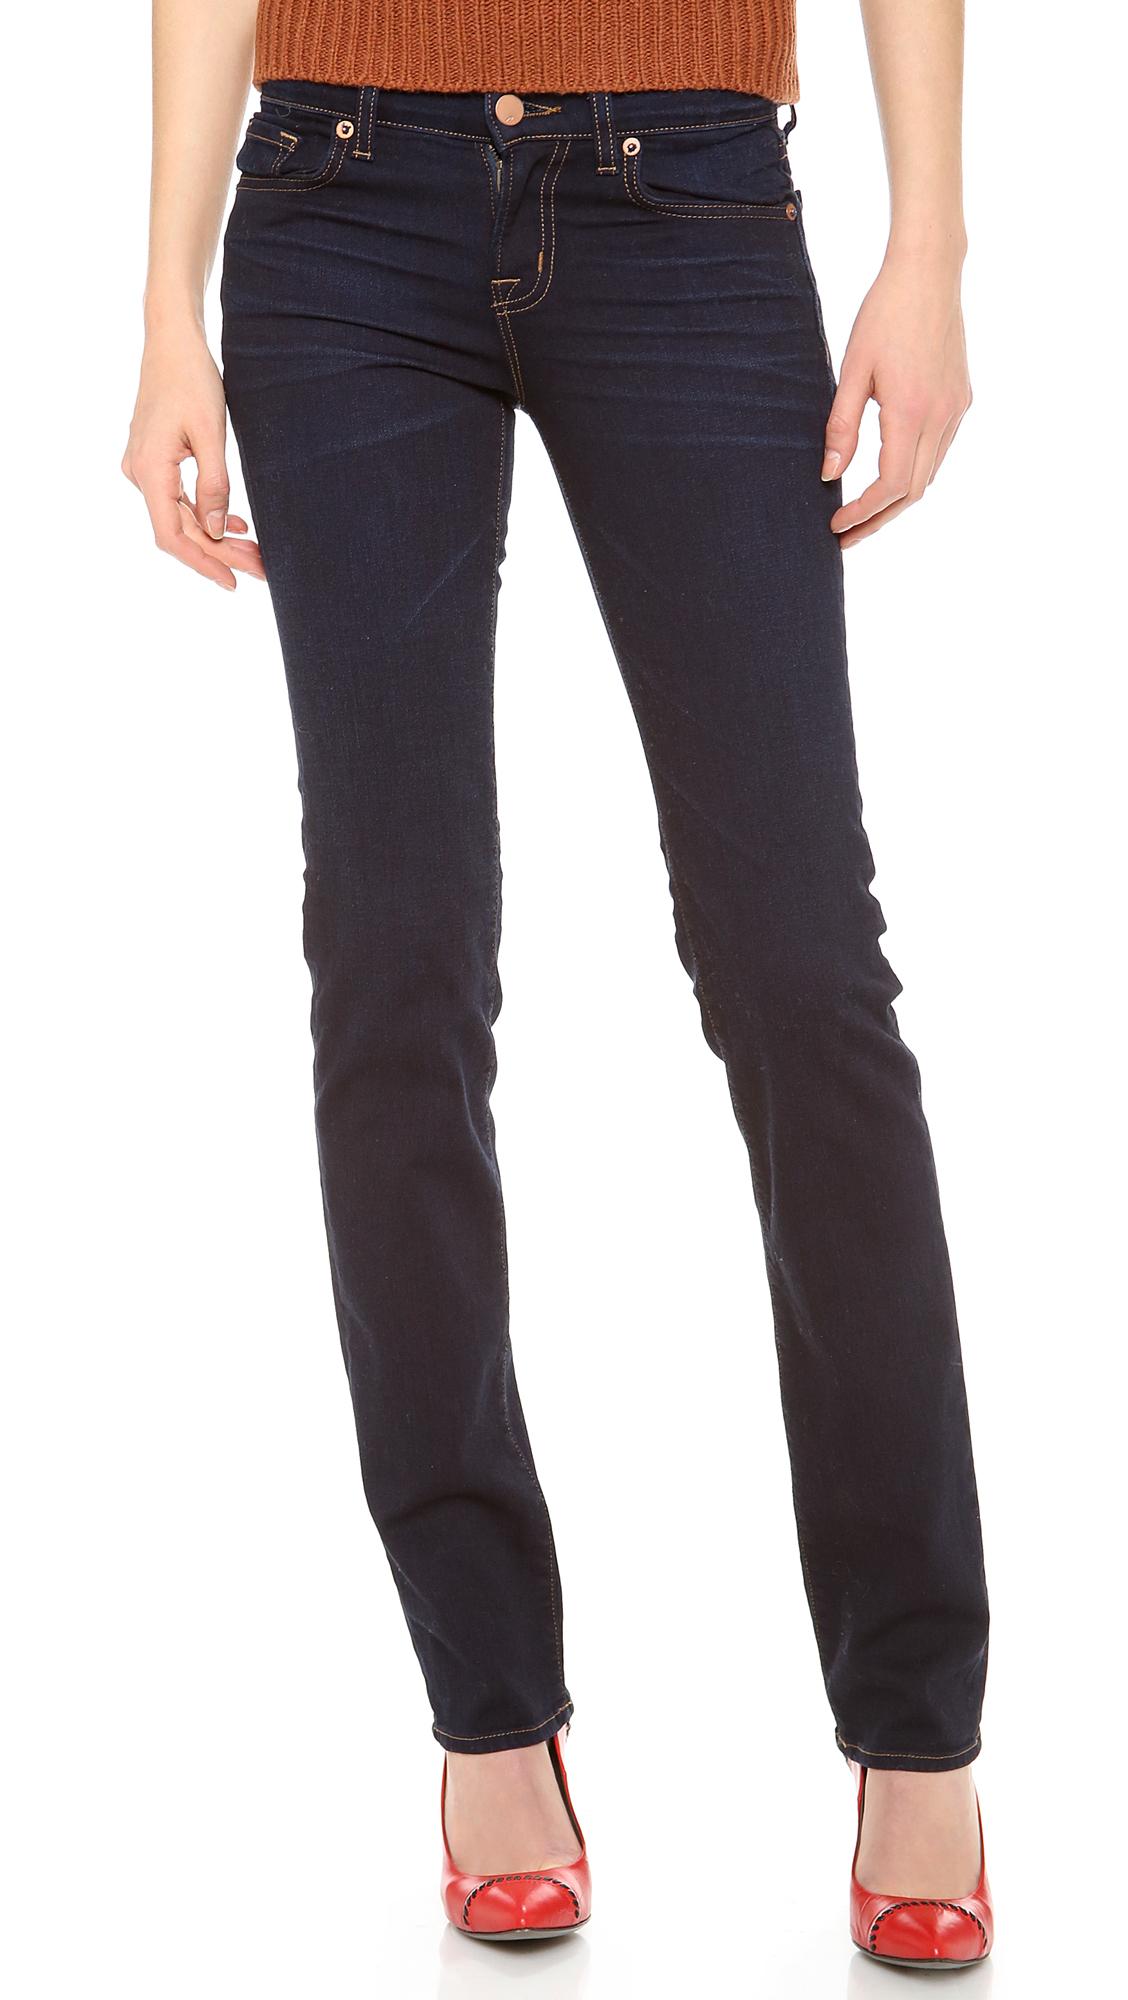 952b216b7df5f J Brand 814 Mid Rise Cigarette Jeans   SHOPBOP